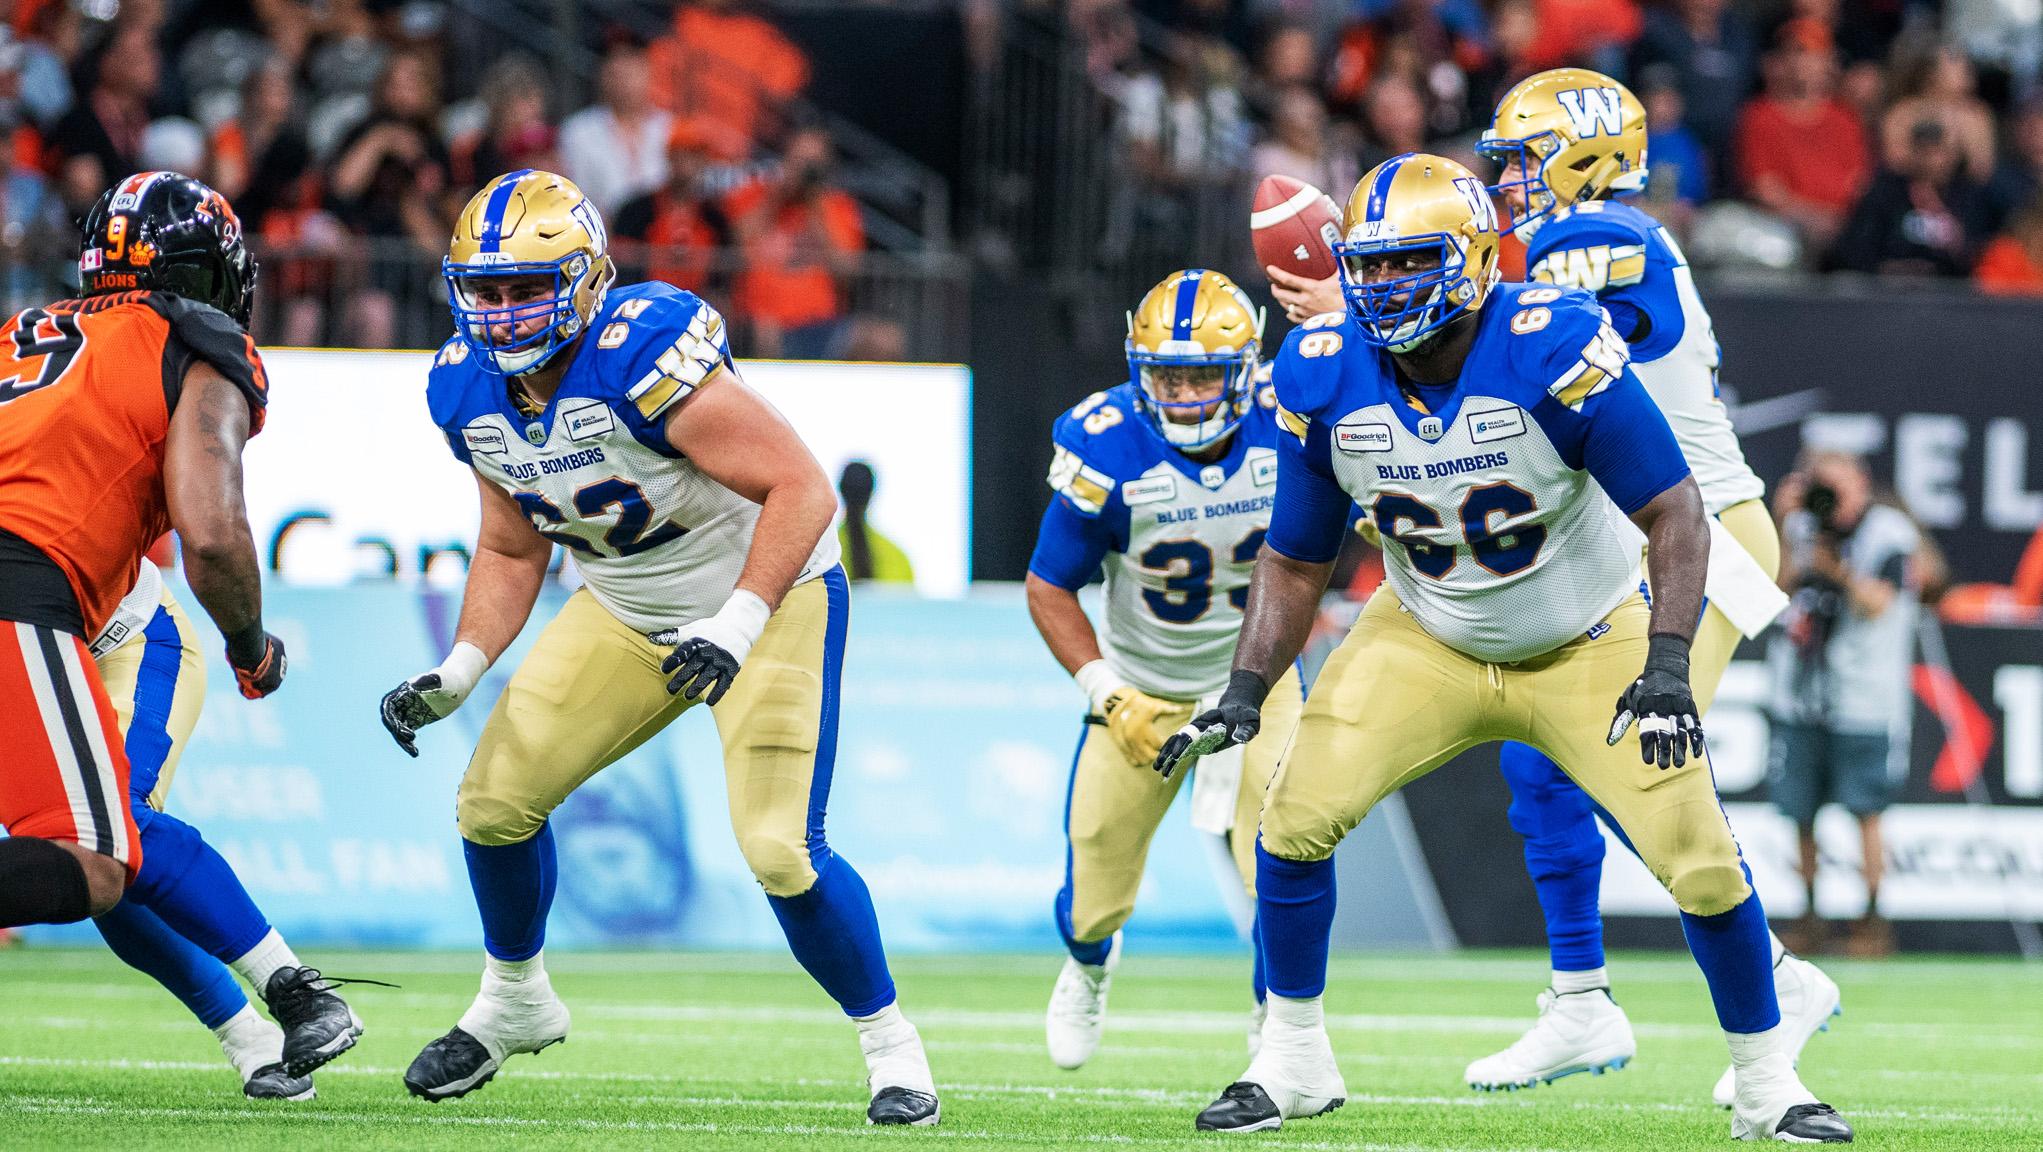 Morris: Revamped O-line dominant in Bombers season-opener - CFL.ca